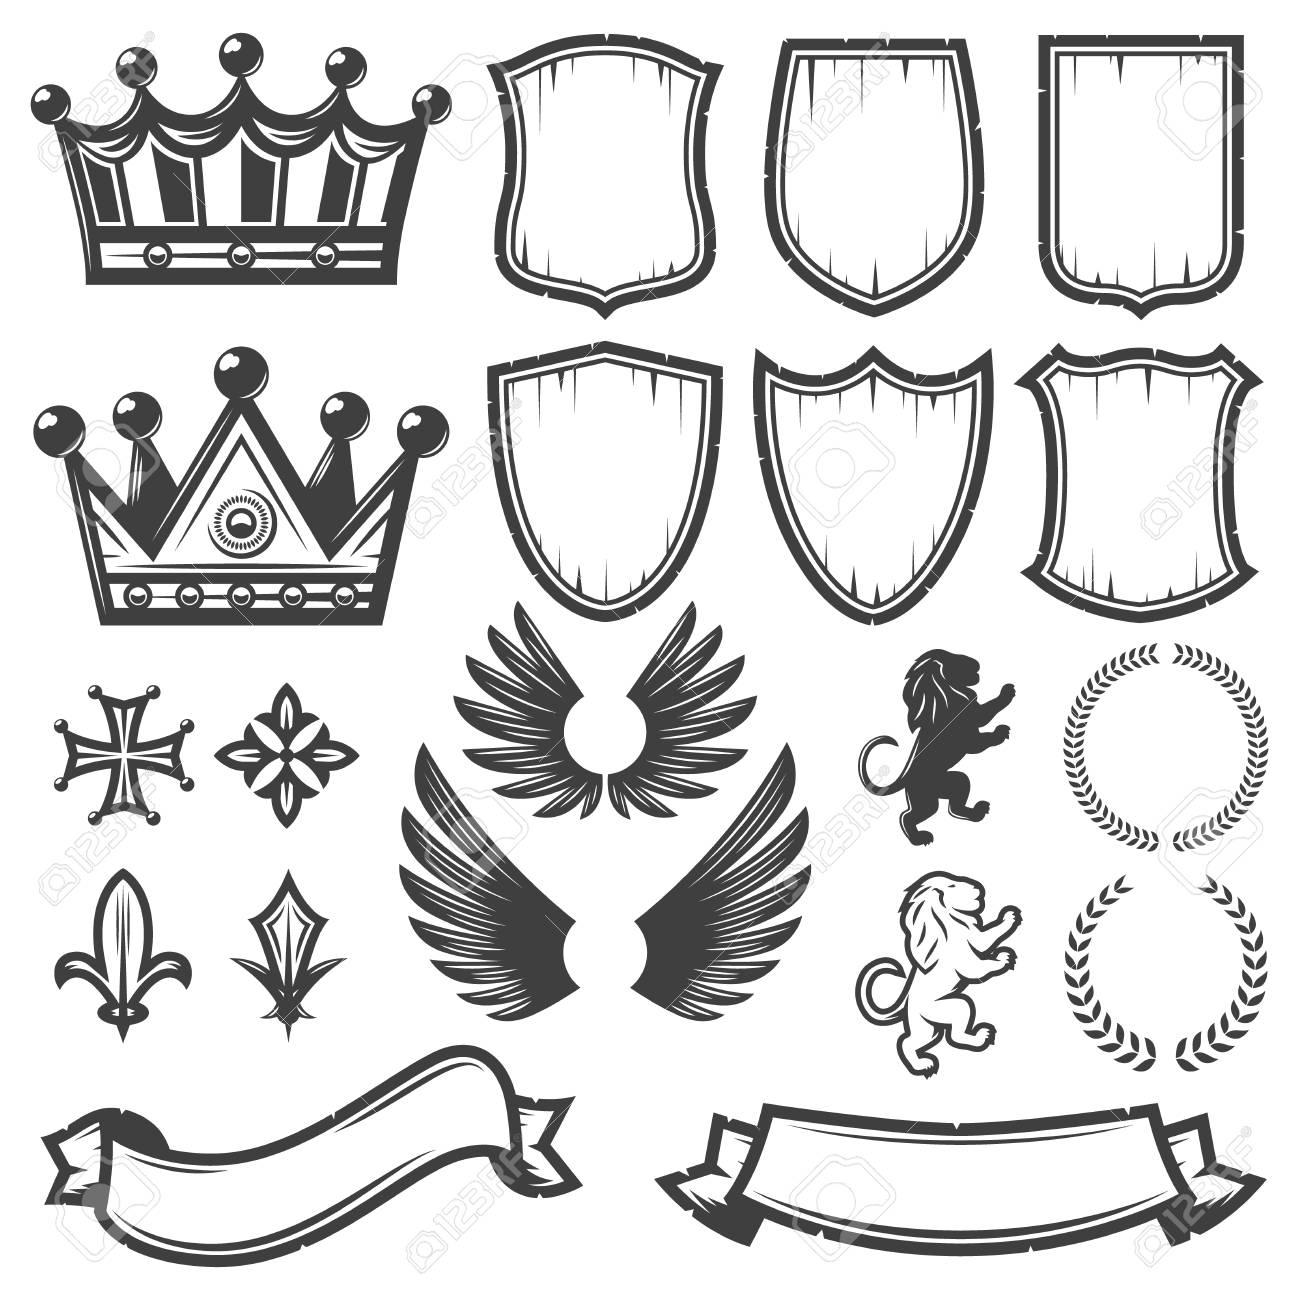 Vintage Monochrome Heraldic Elements Collection - 90134918